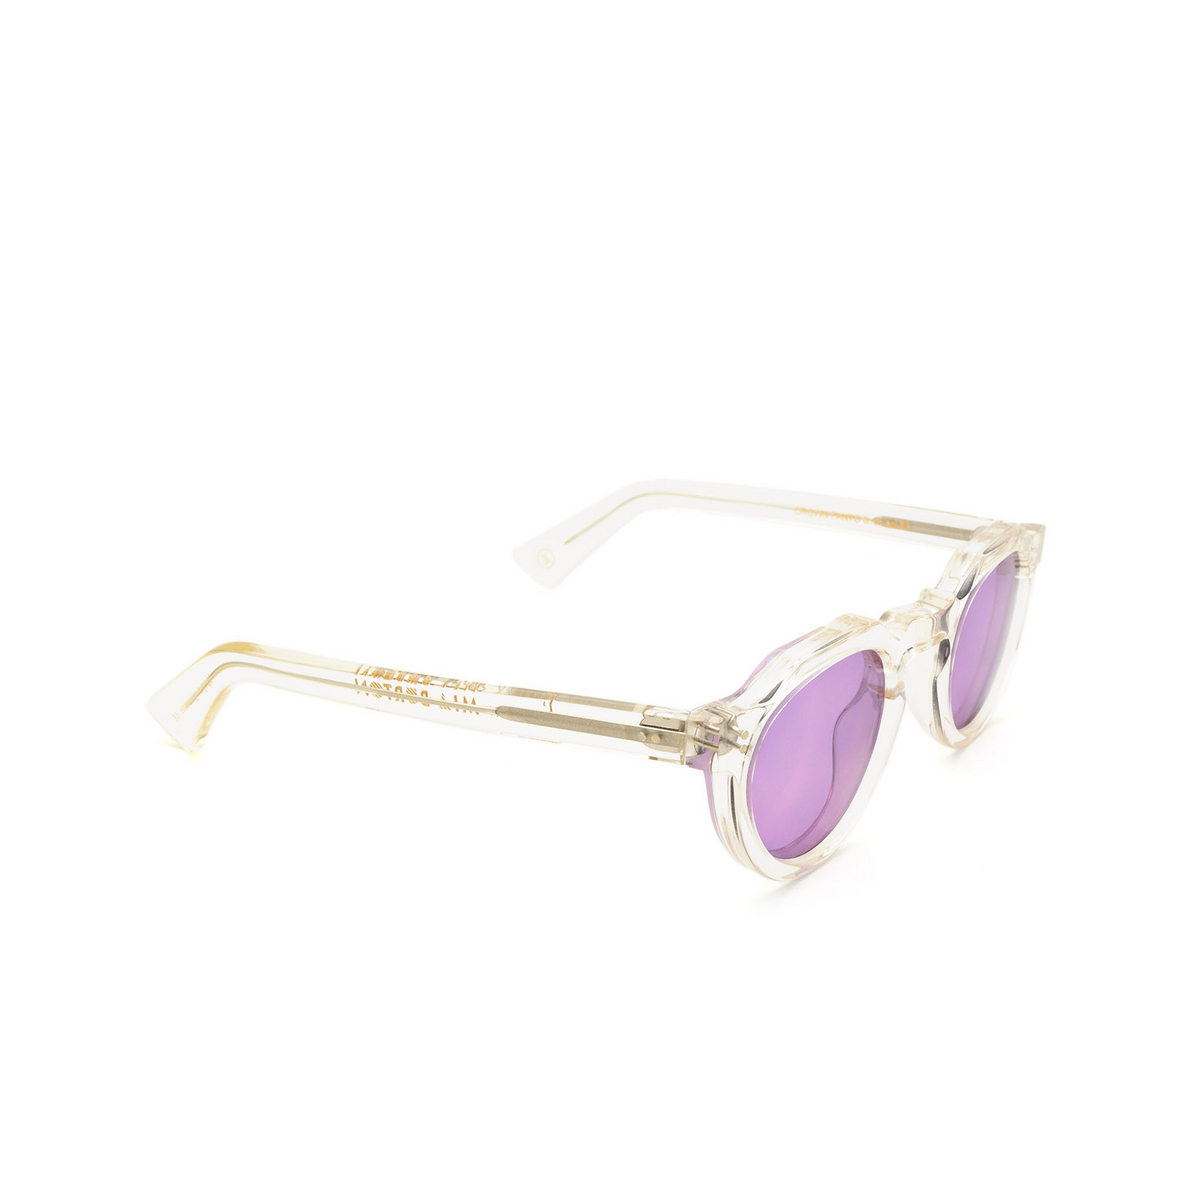 Lesca® Irregular Sunglasses: Crown Panto X Mia Burton color 21 - BRAVE PURPLE - three-quarters view.